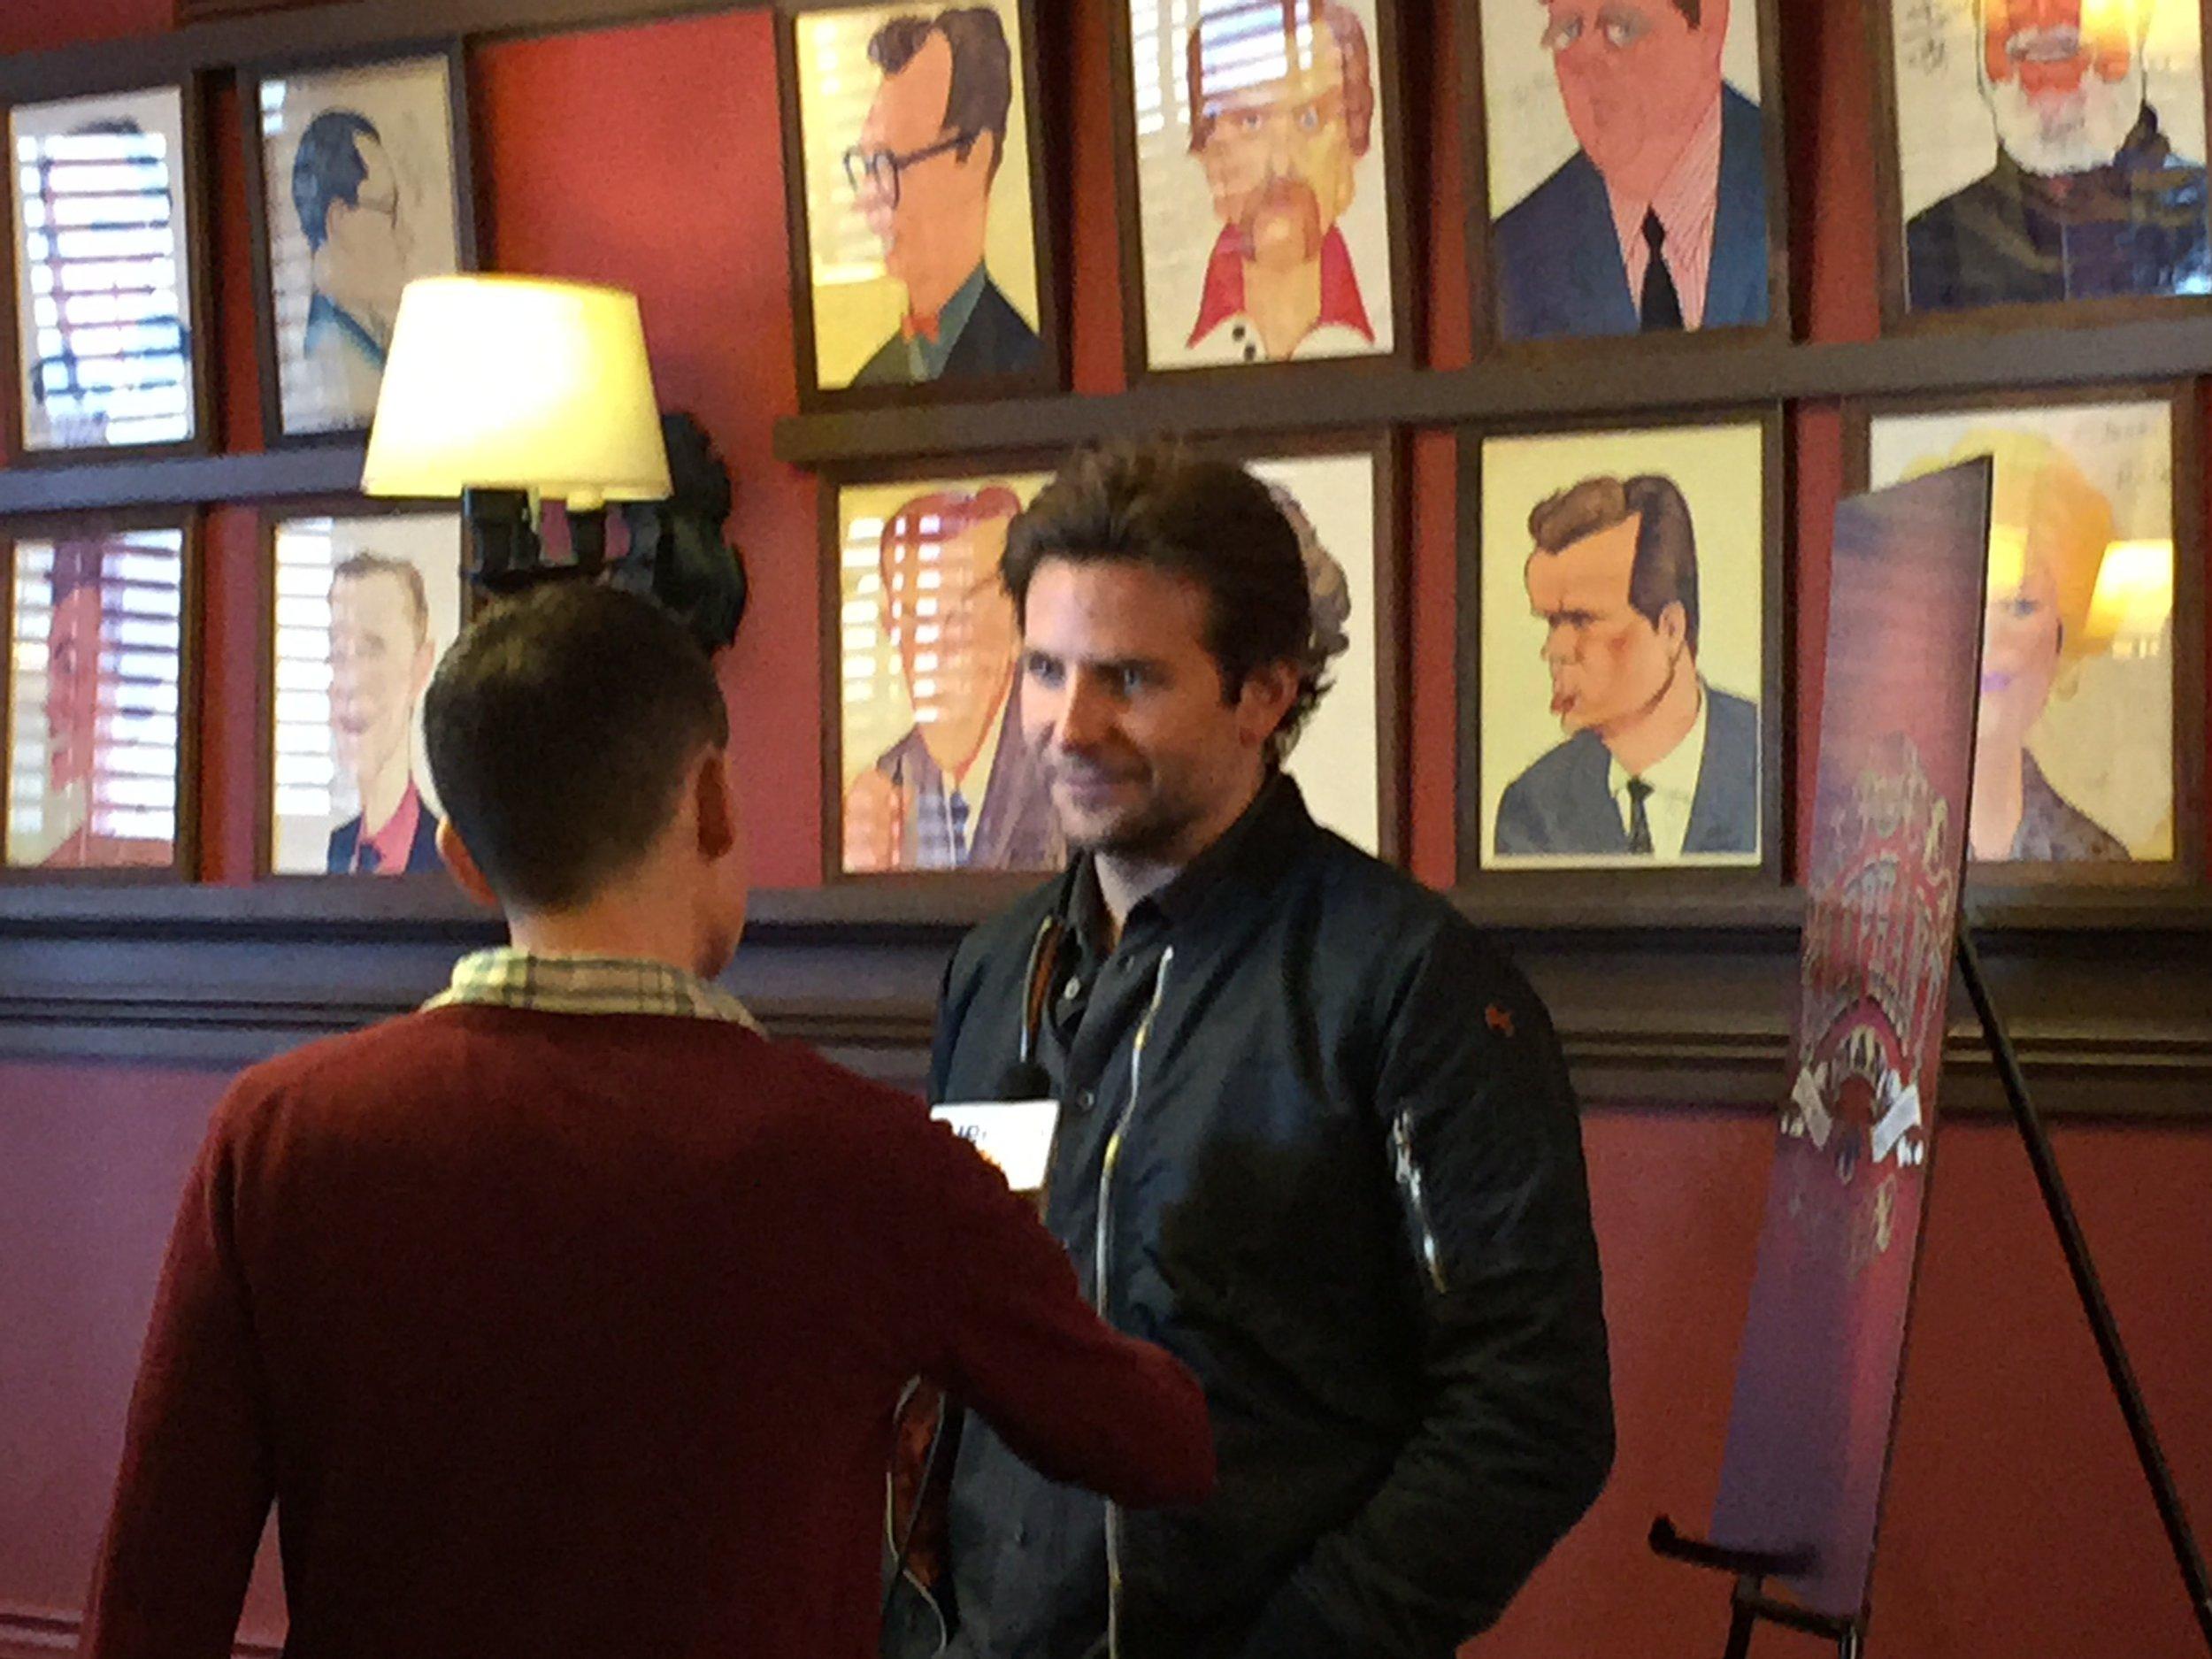 Bradley Cooper at Sardi's Press Event (Photo by Scott)